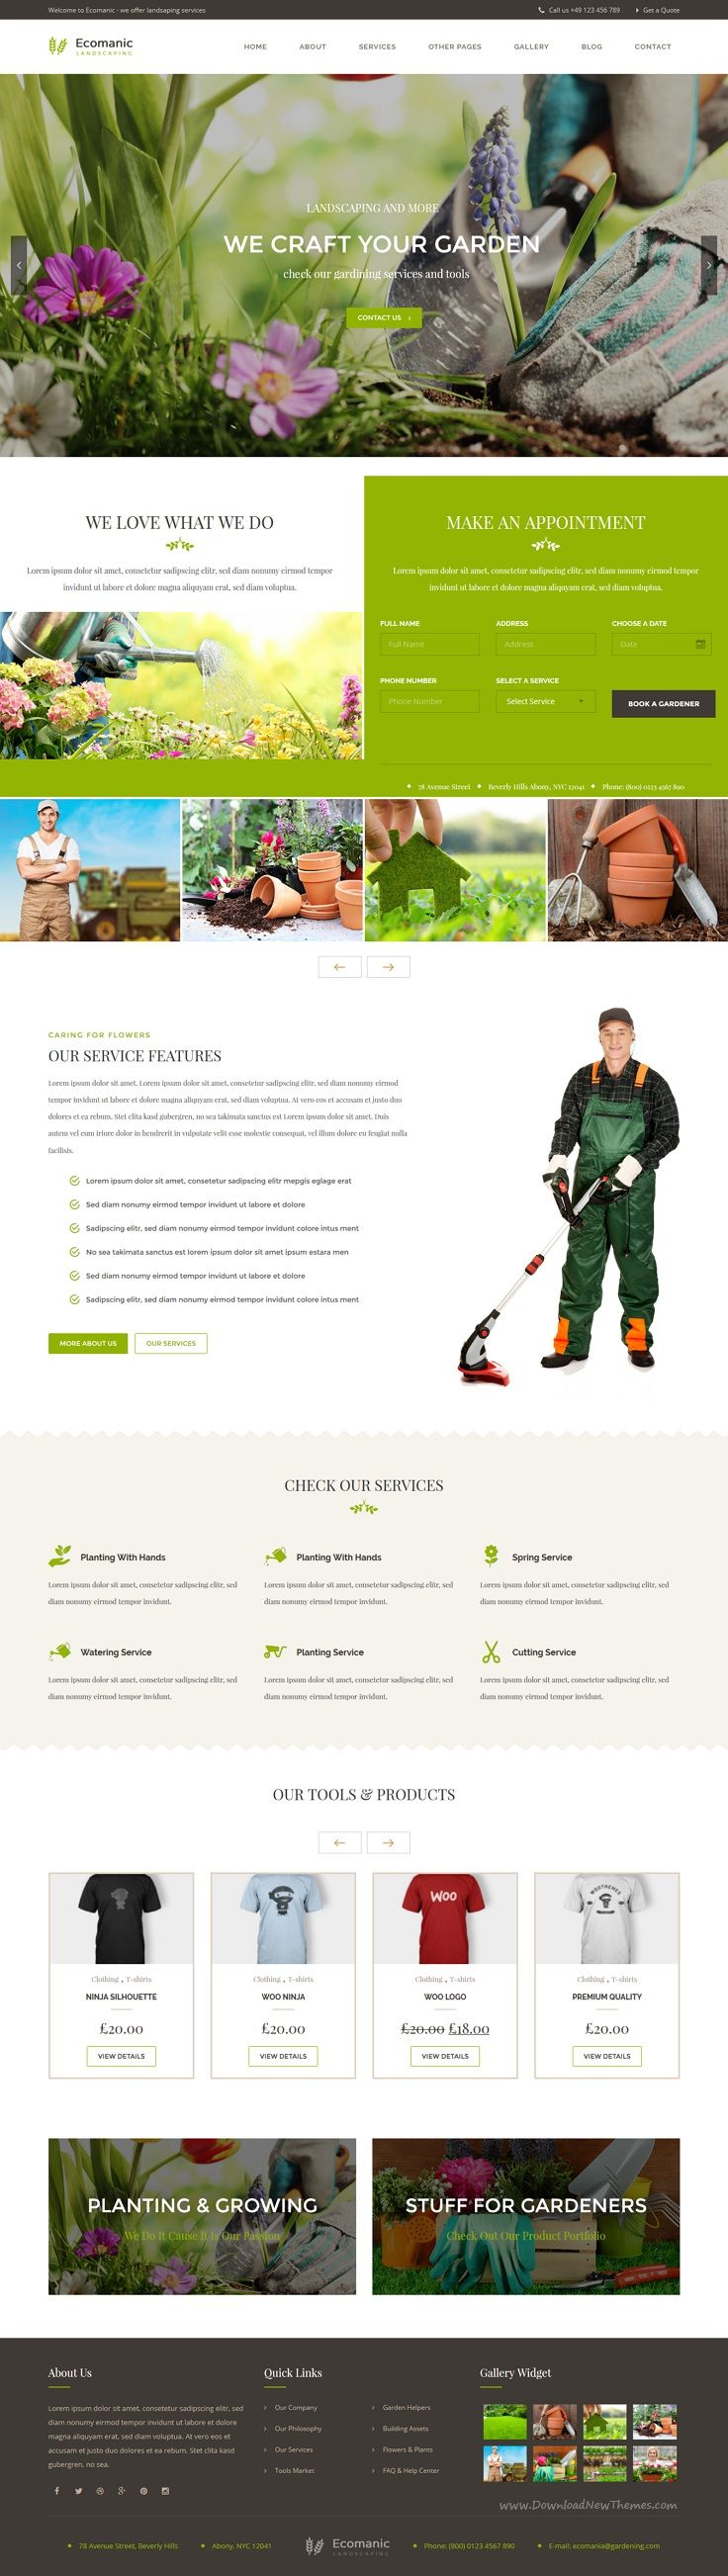 best 25 lawn care business ideas on pinterest lawn mowing